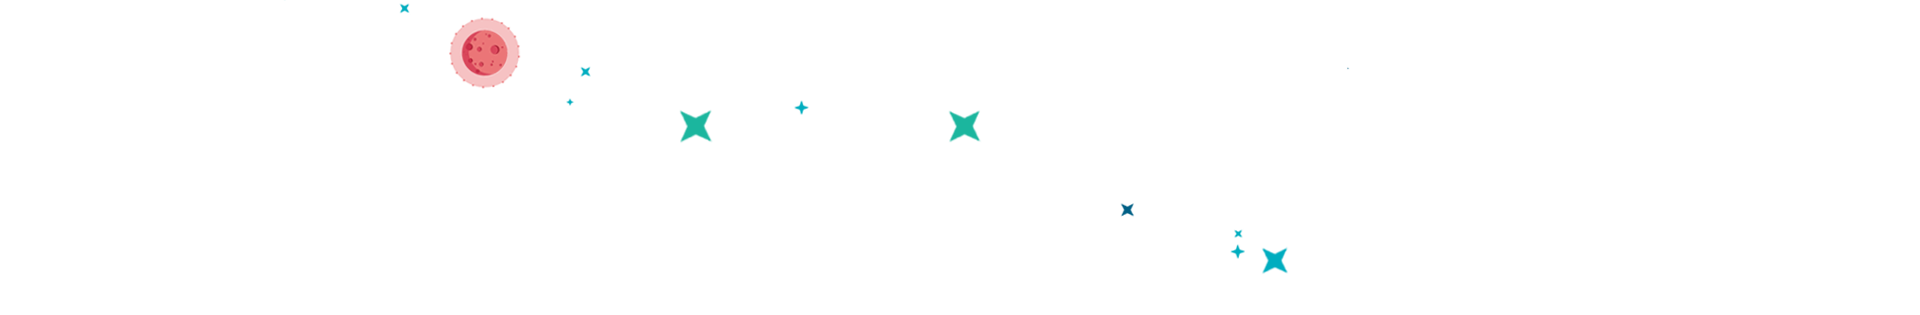 step-servizi-proposta